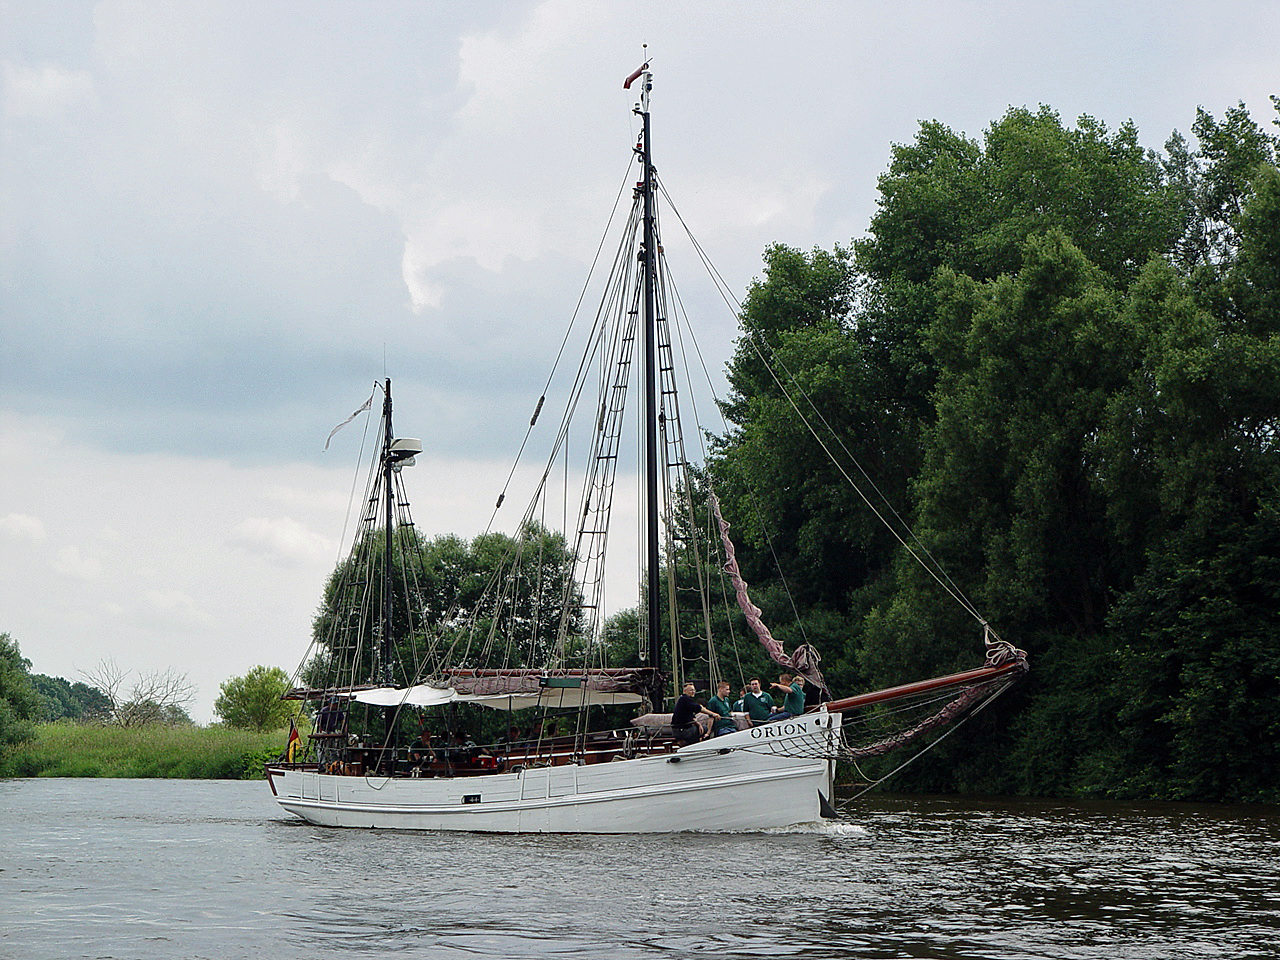 Orion Bremen